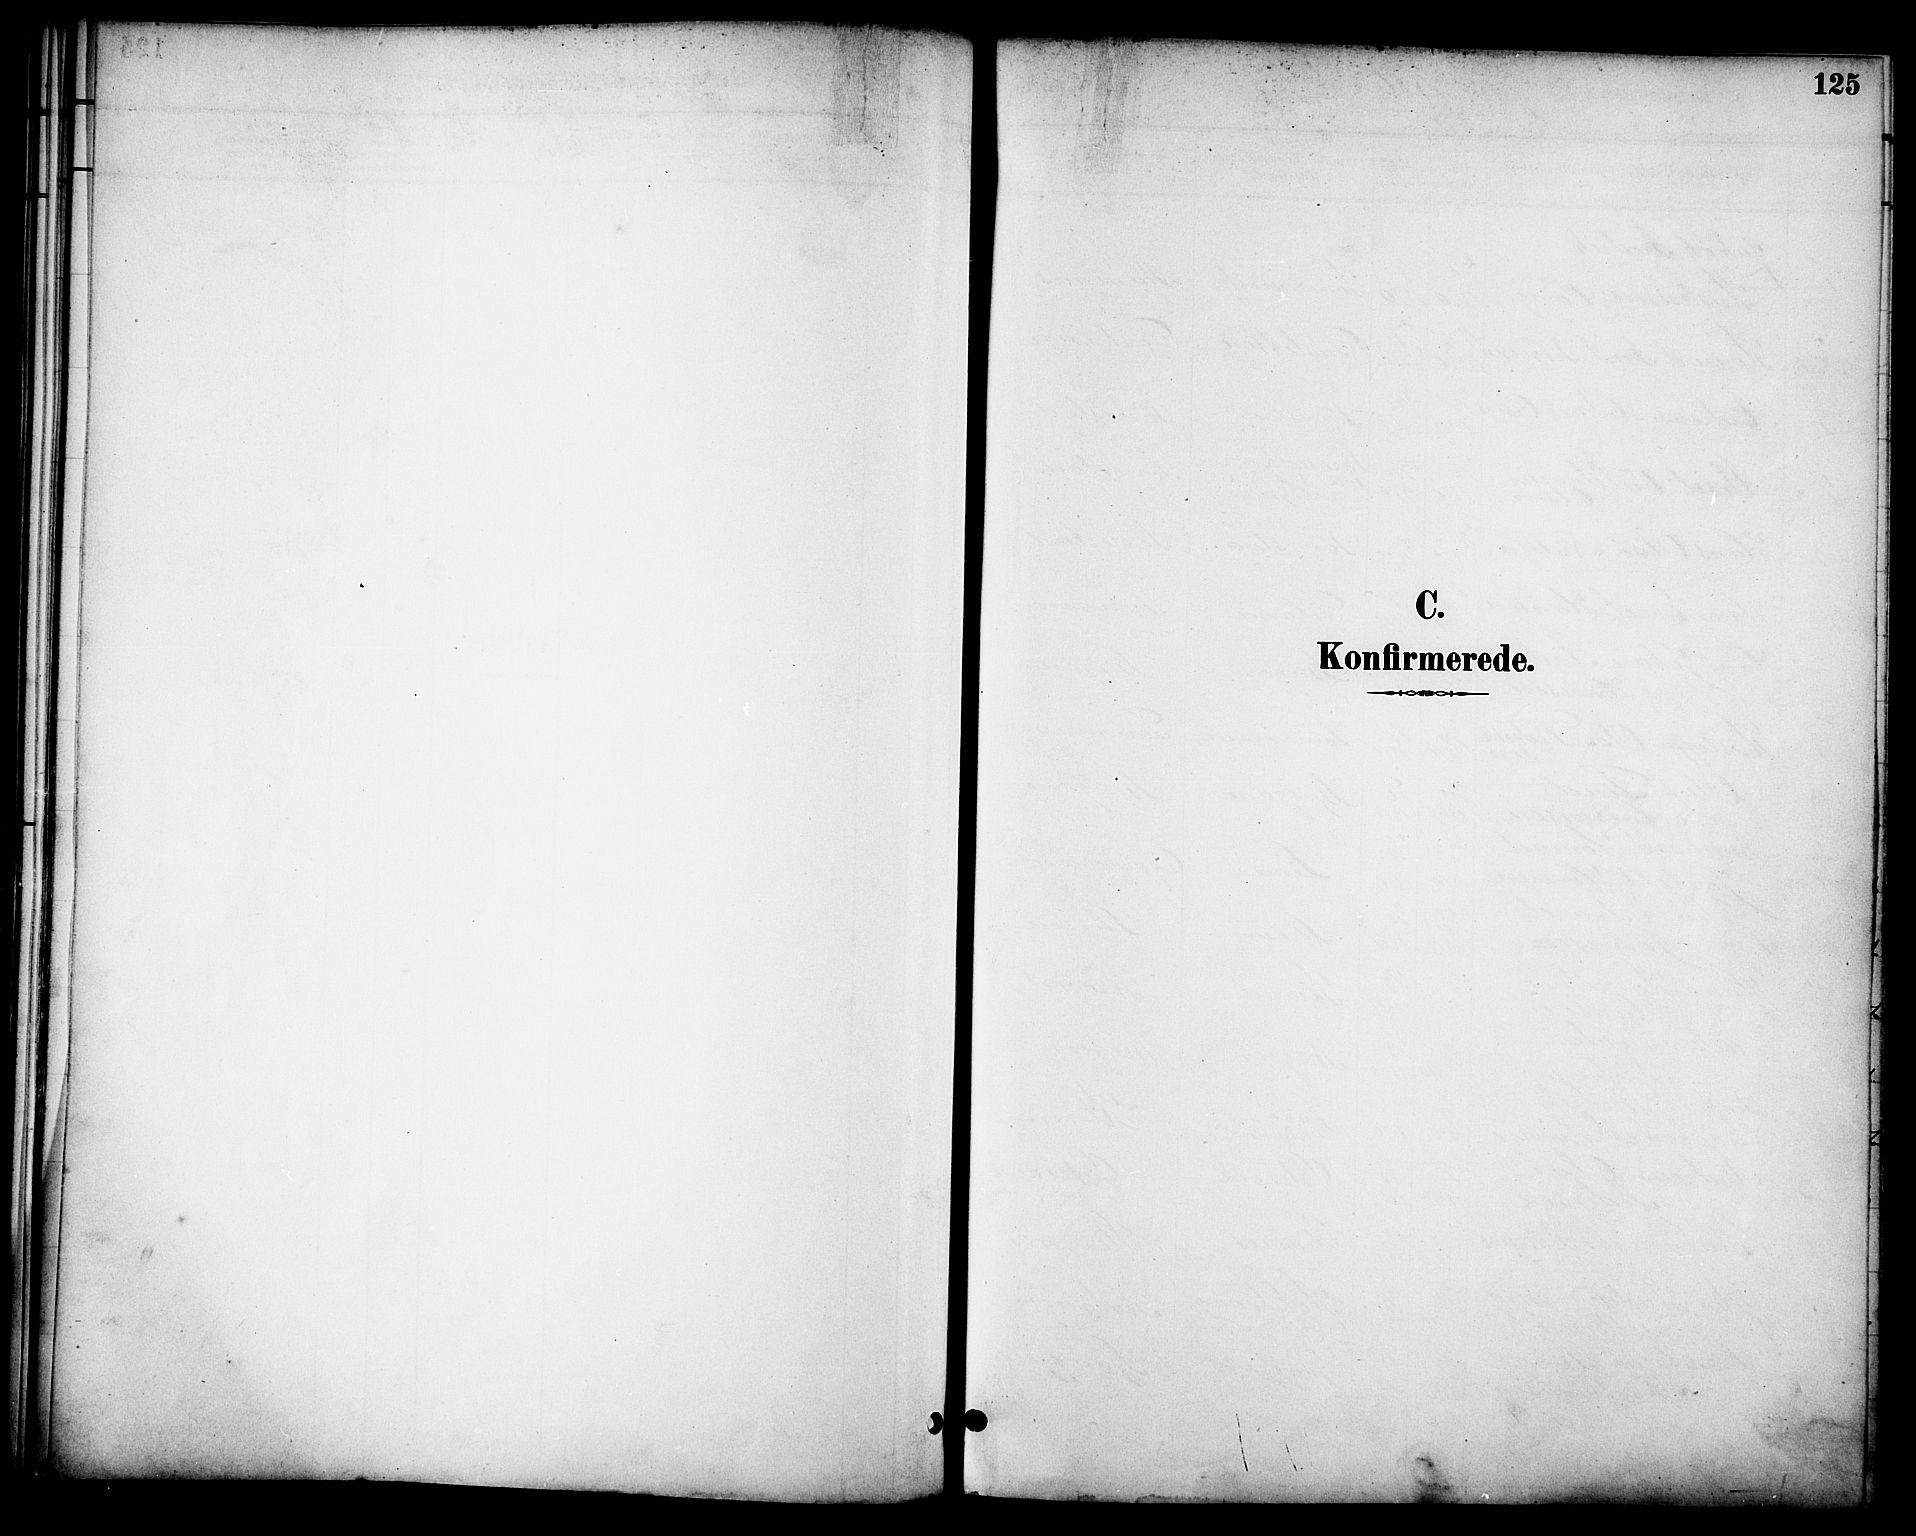 SAT, Ministerialprotokoller, klokkerbøker og fødselsregistre - Nordland, 863/L0898: Ministerialbok nr. 863A10, 1886-1897, s. 125